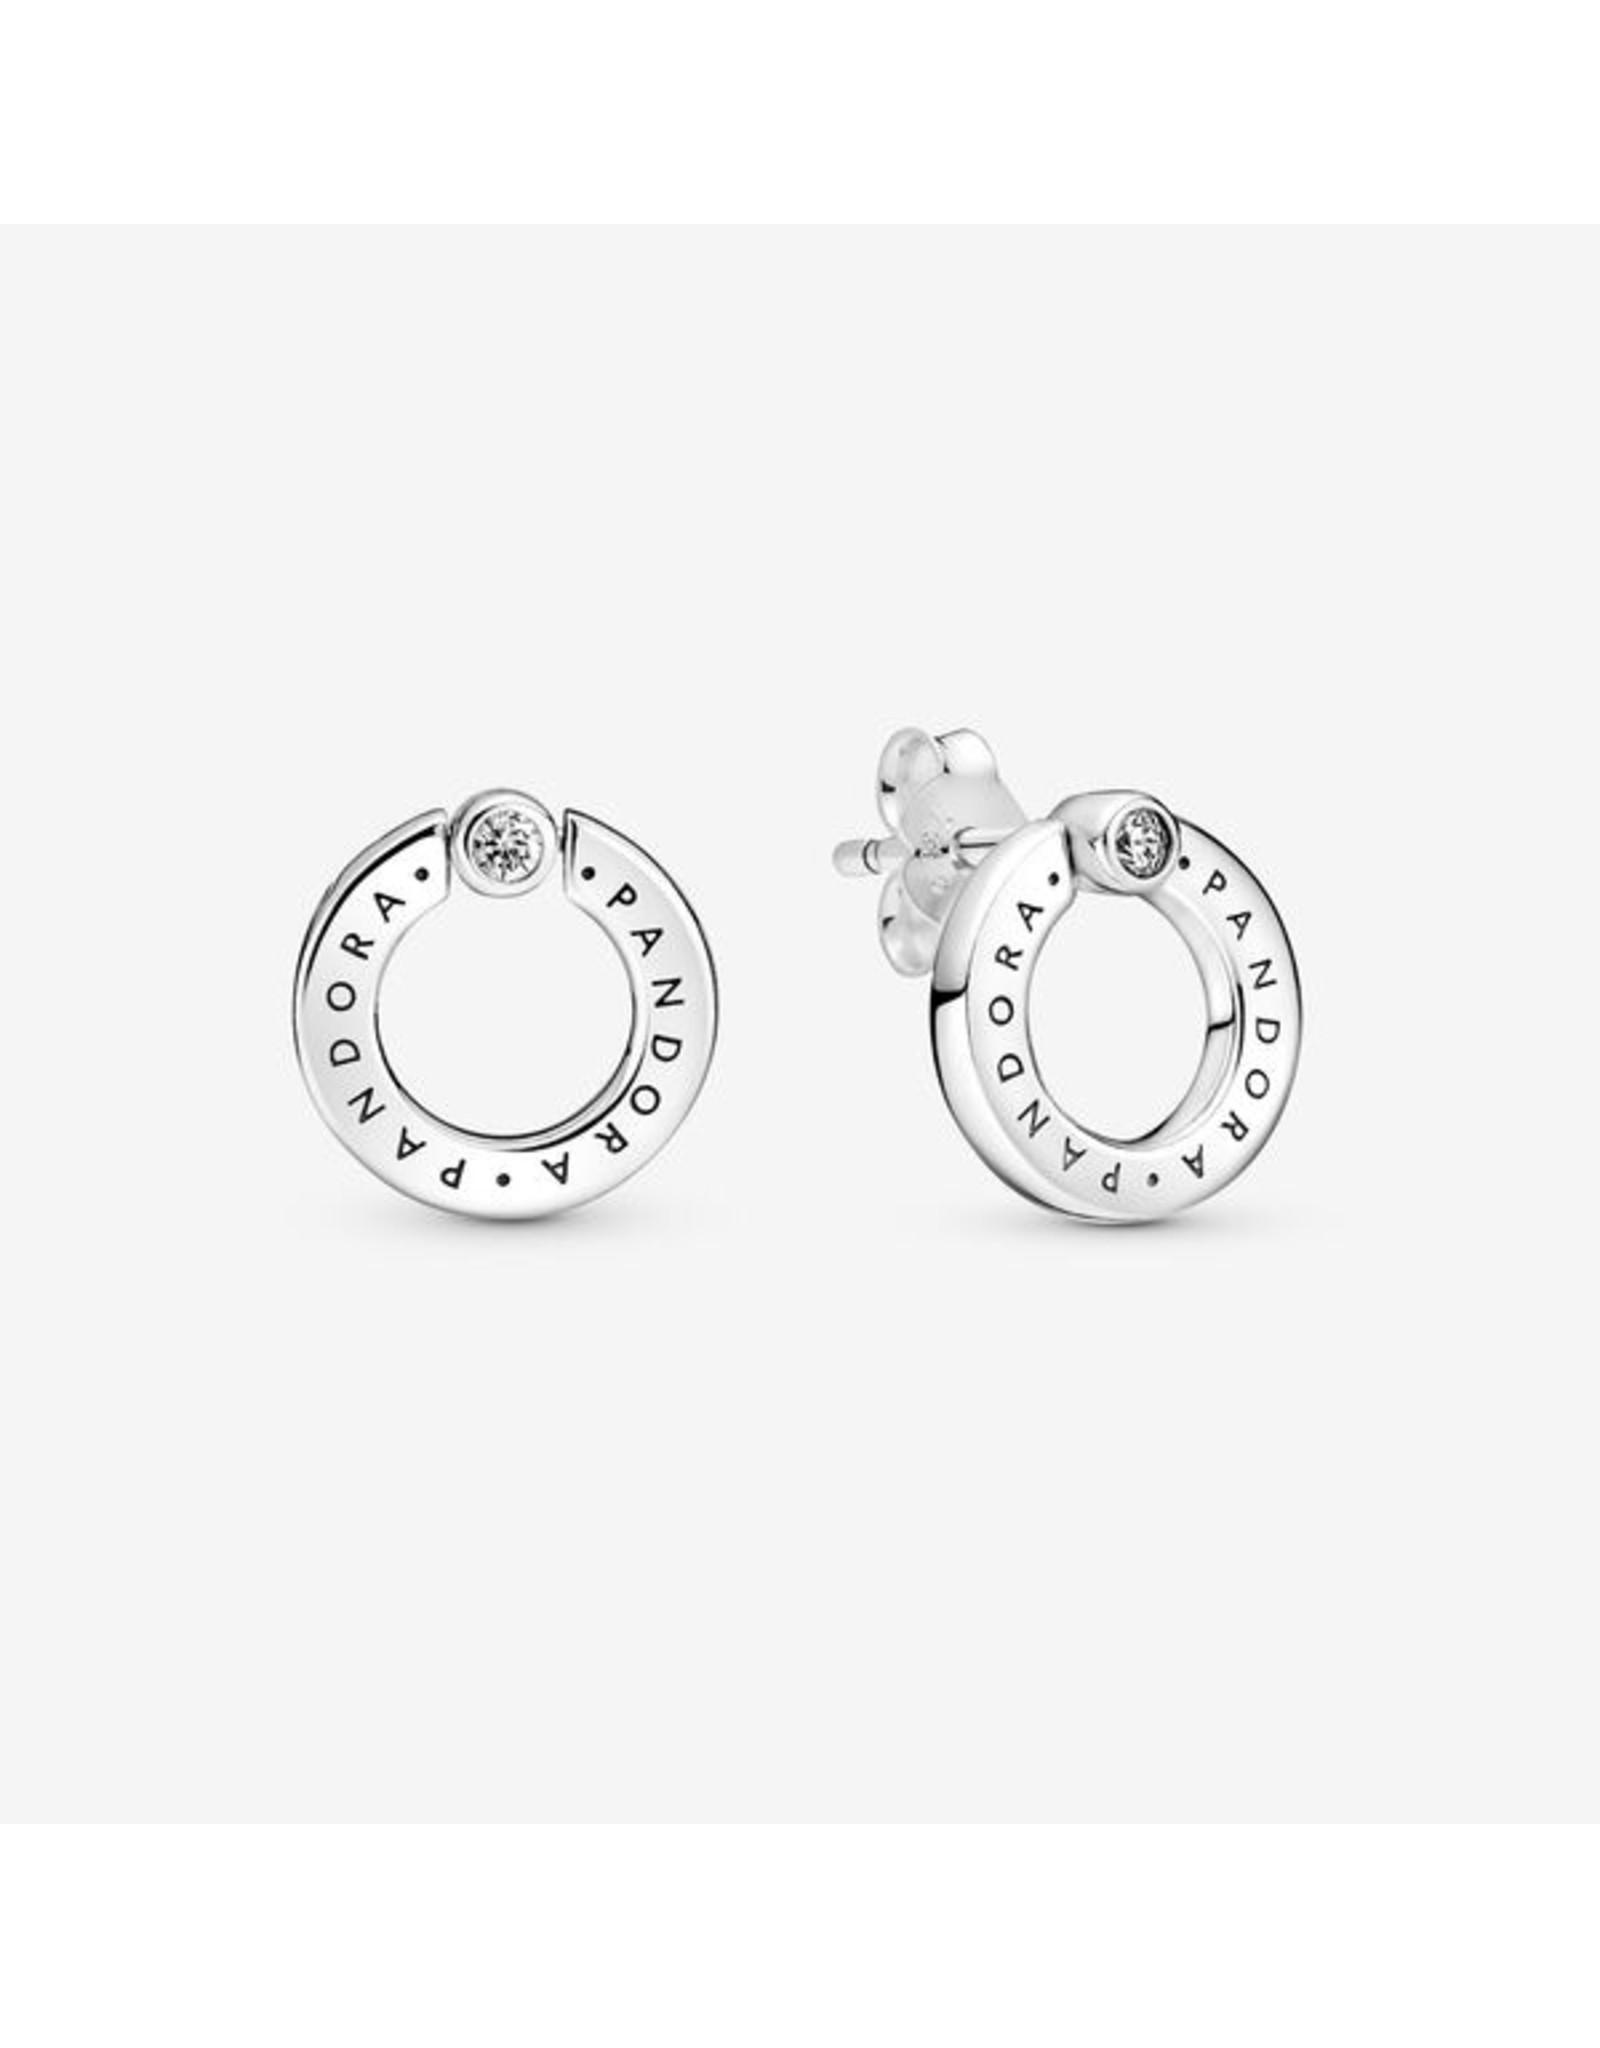 Pandora Pandora Earrings, 299486C01, Pave & Logo Circle Reversible Stud, Clear CZ